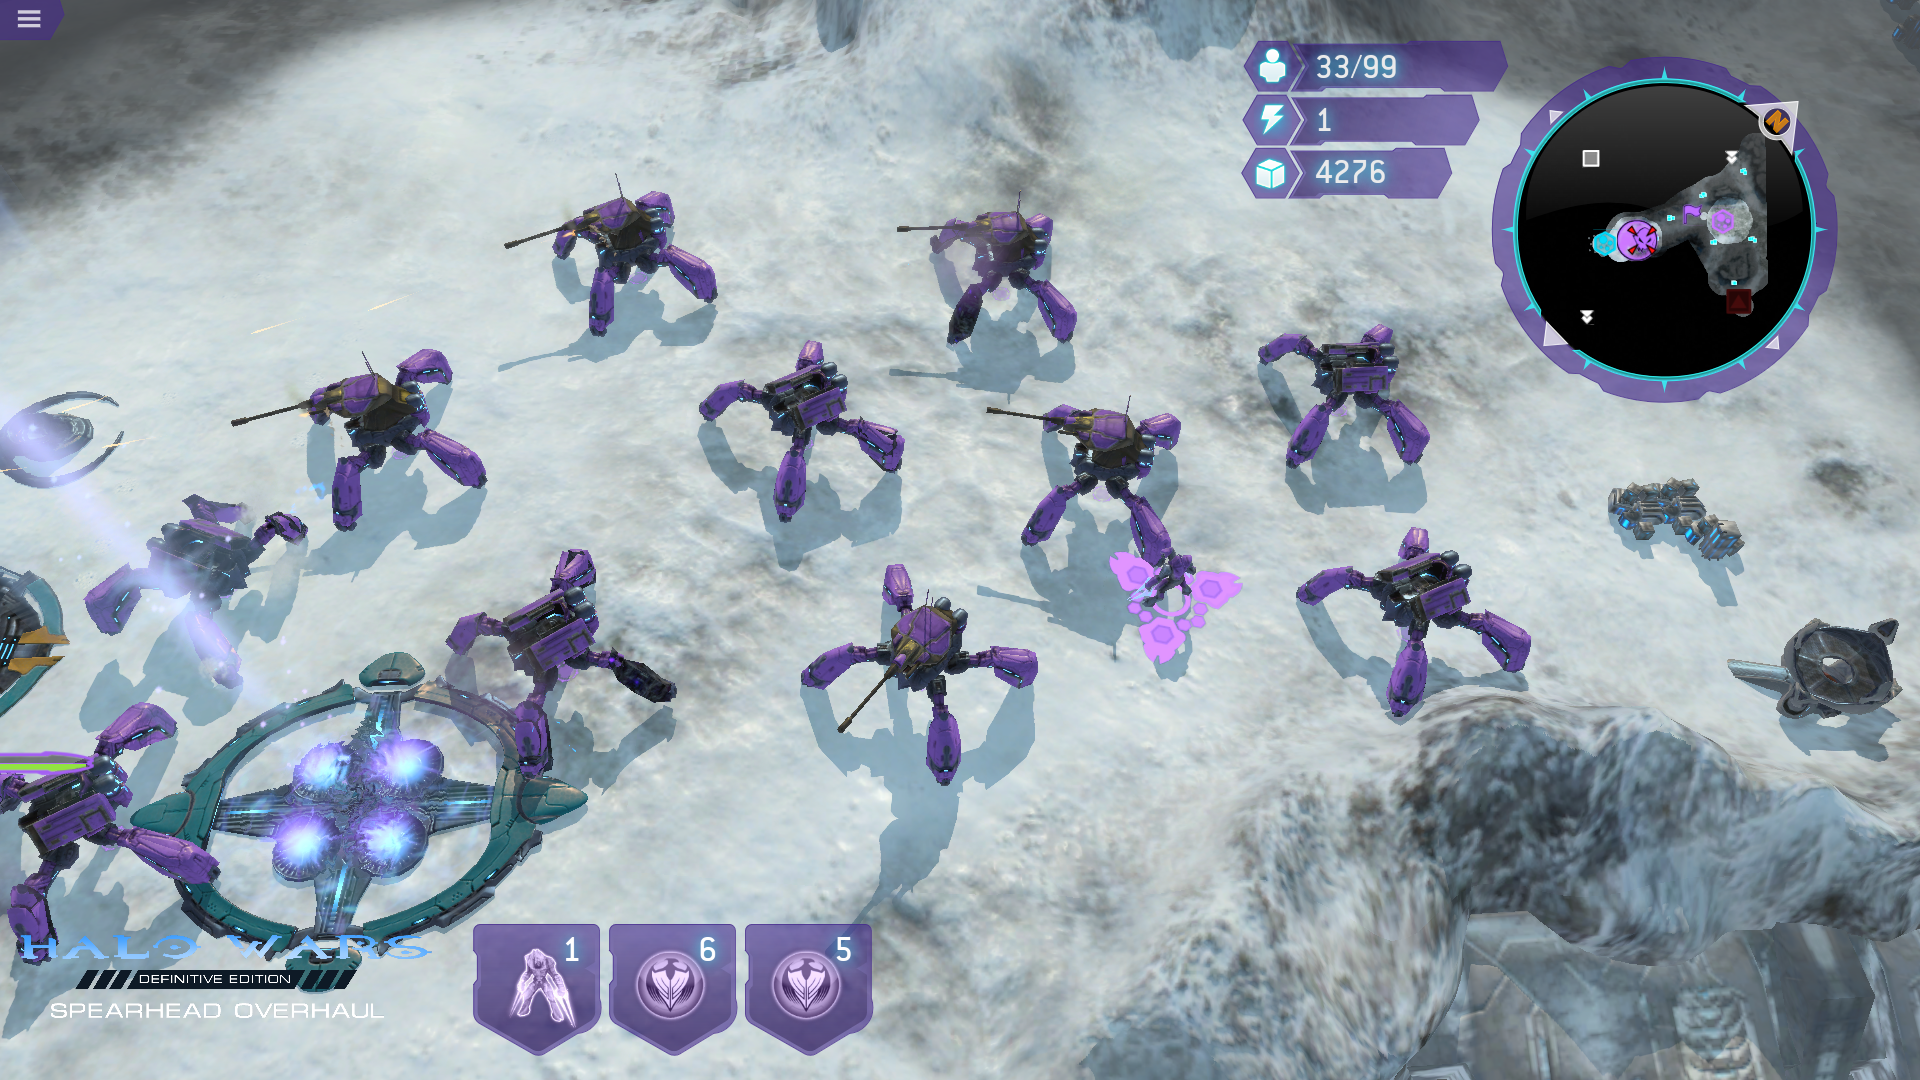 Screen12 image - Halo Wars: Spearhead Overhaul mod for Halo